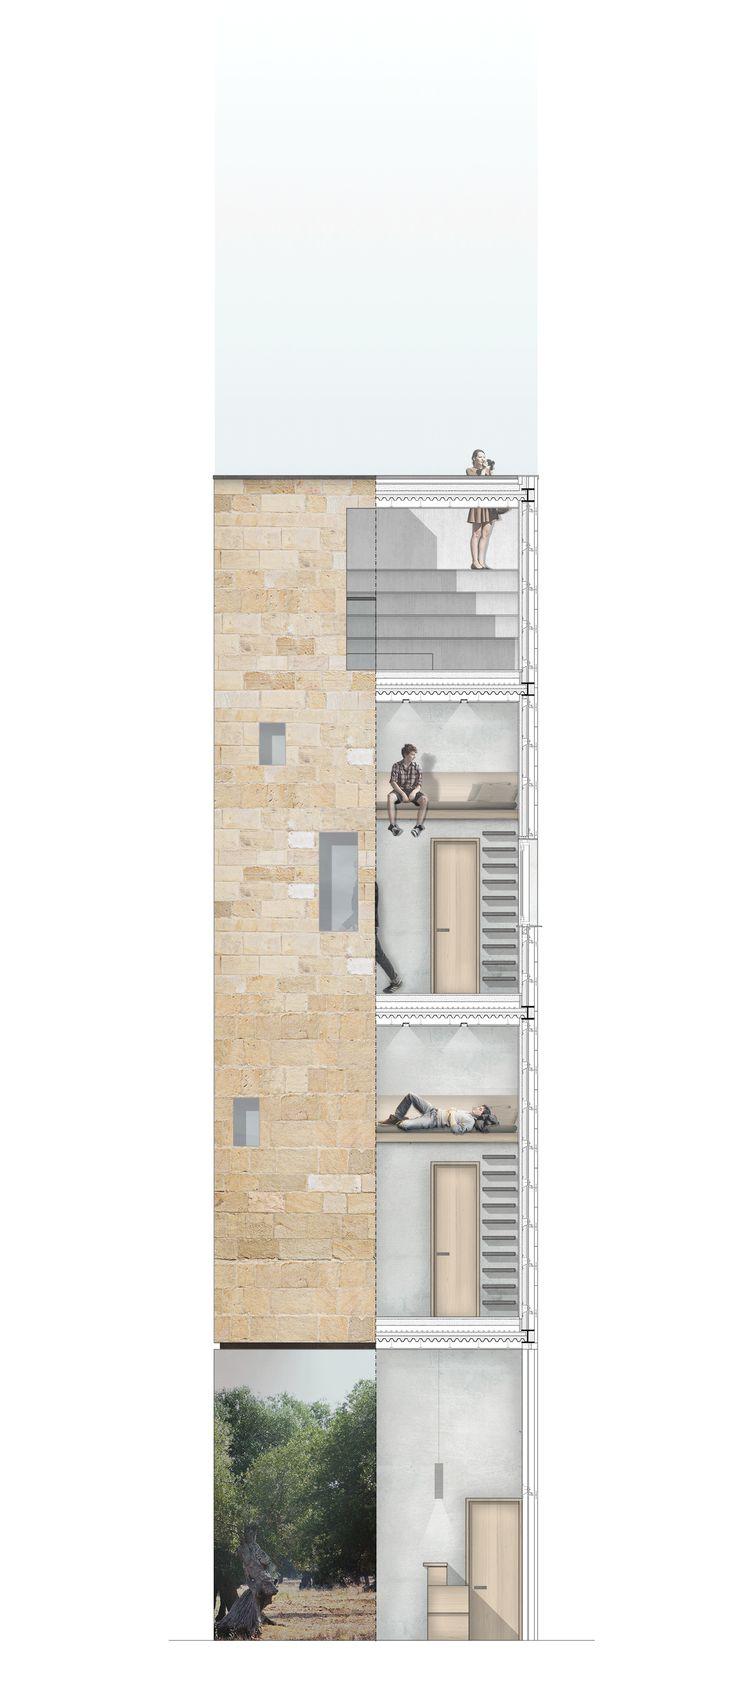 02_section and elevations | Luglio 2014 | Architectural Competition for students and young architects. Archistart. LHT LeveranoHorizonTower. Riflessi di paesaggio project francesco polci giacomo razzolini antonio salvi